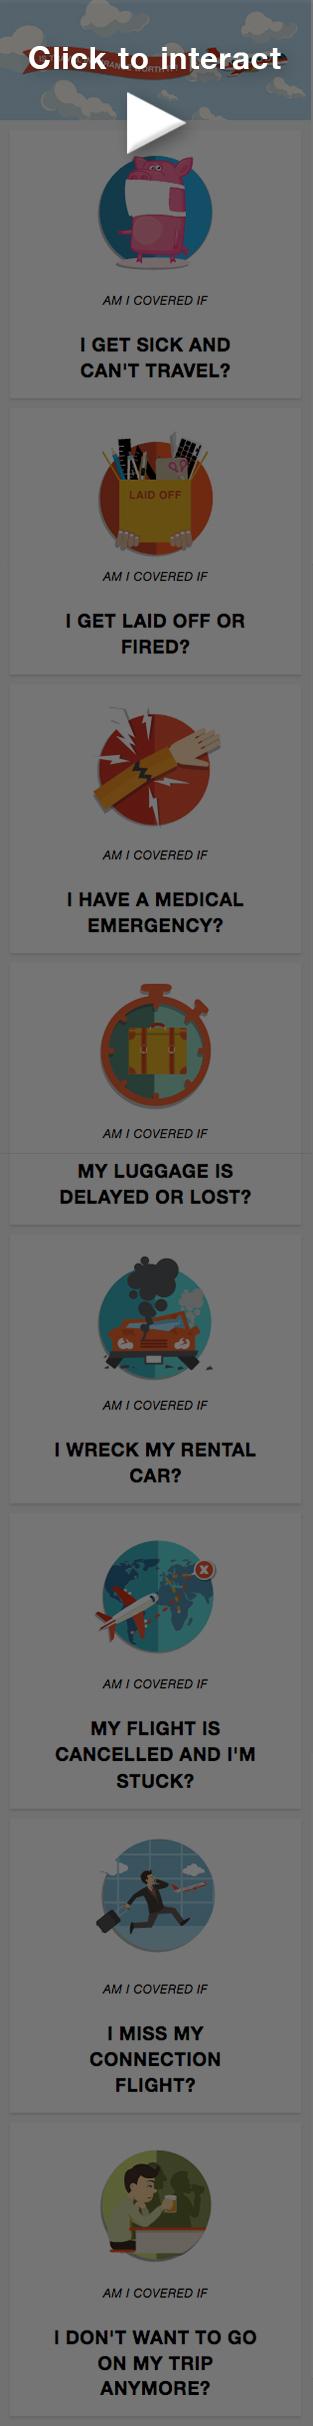 Best Travel Insurance Companies | ConsumerAffairs